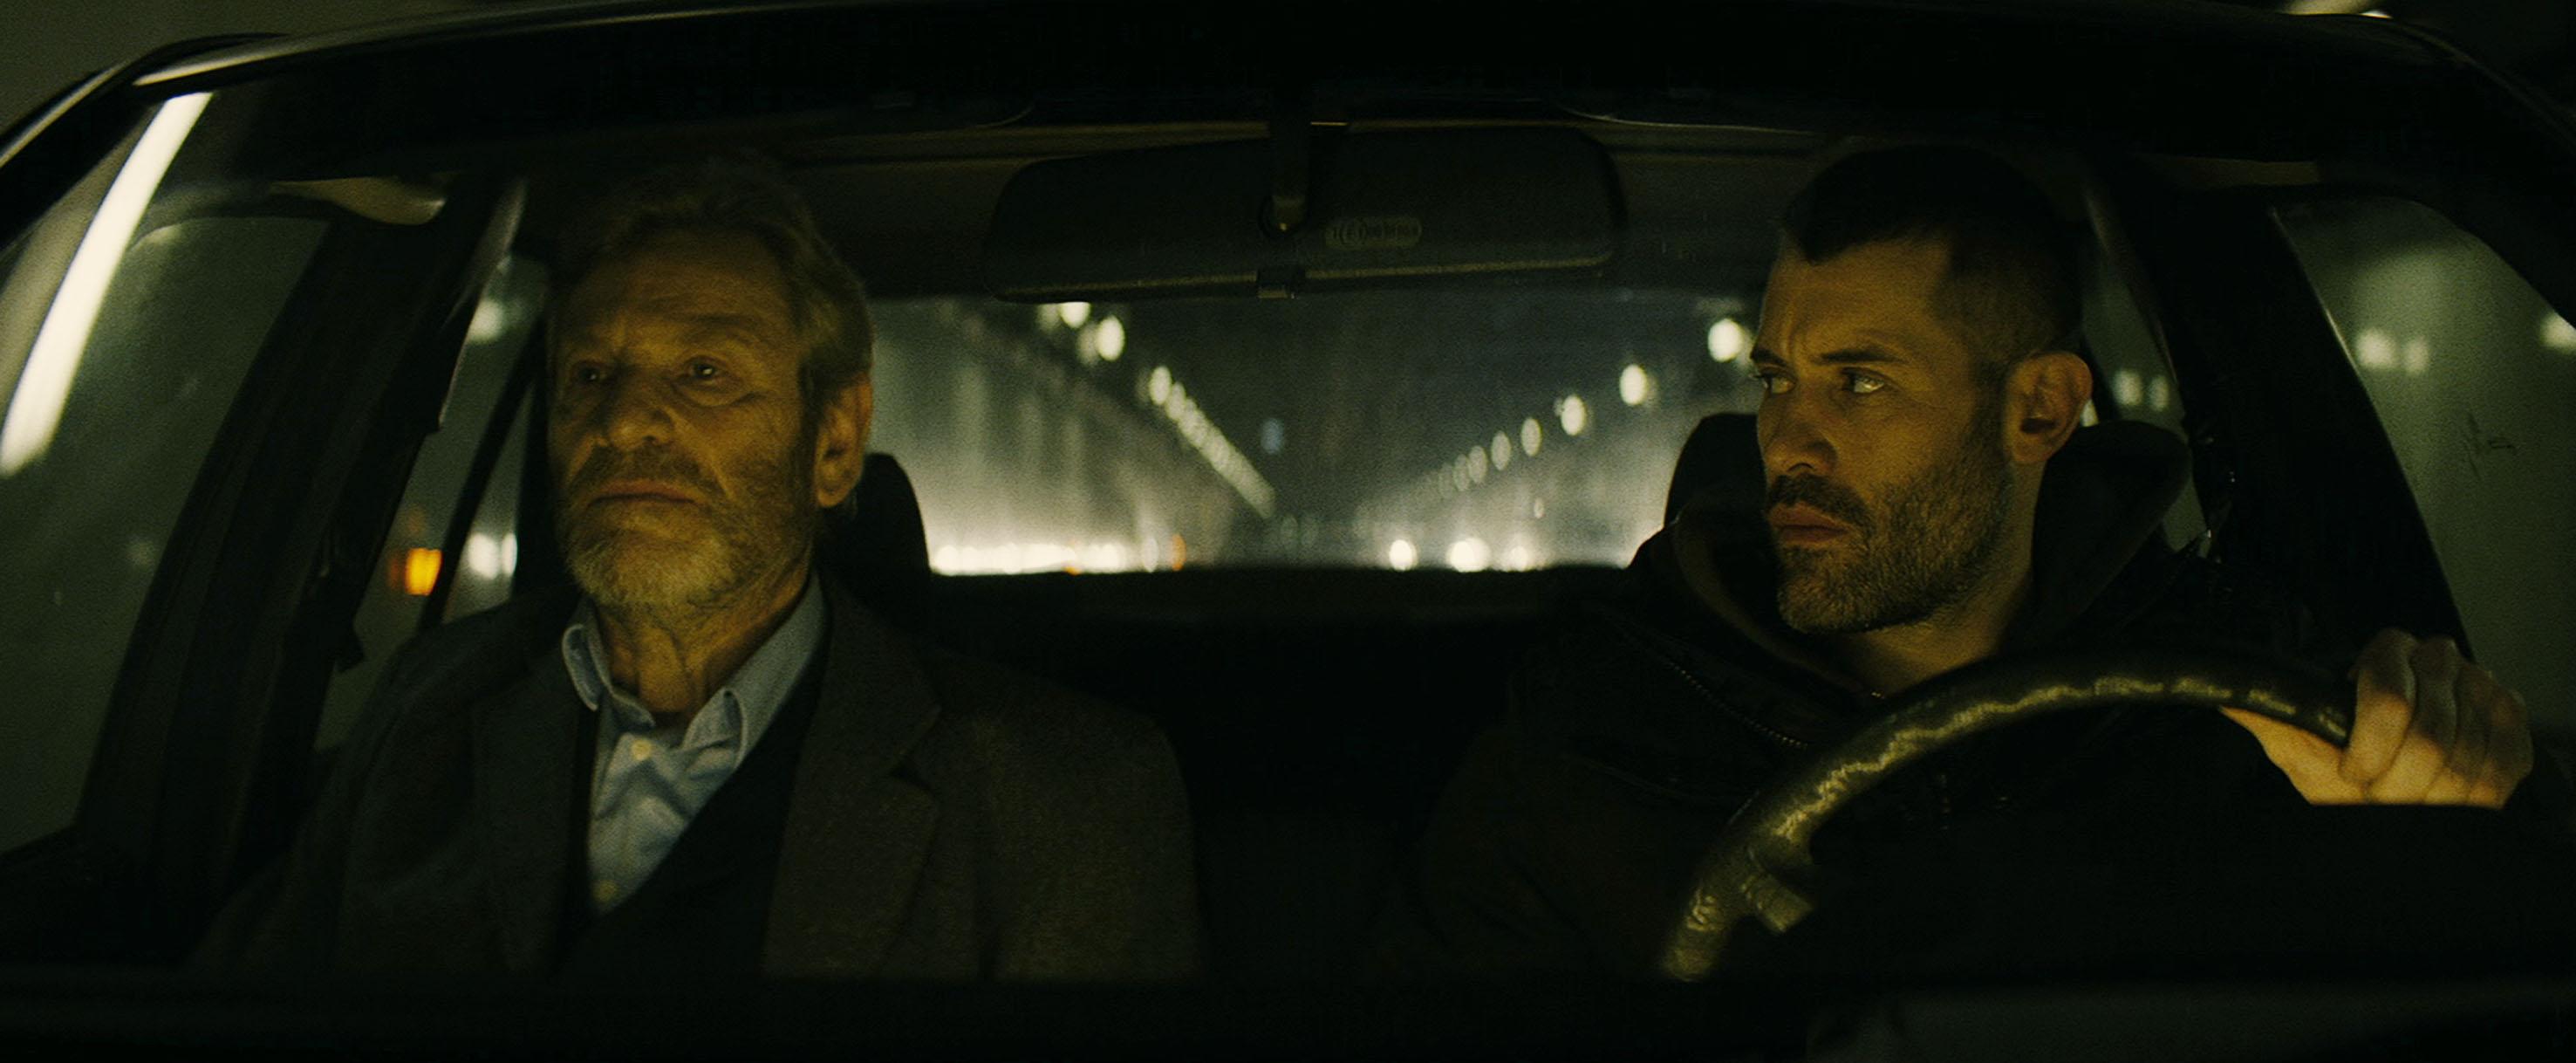 De-Guerre-Lasse-Polar-Thriller-Image-1